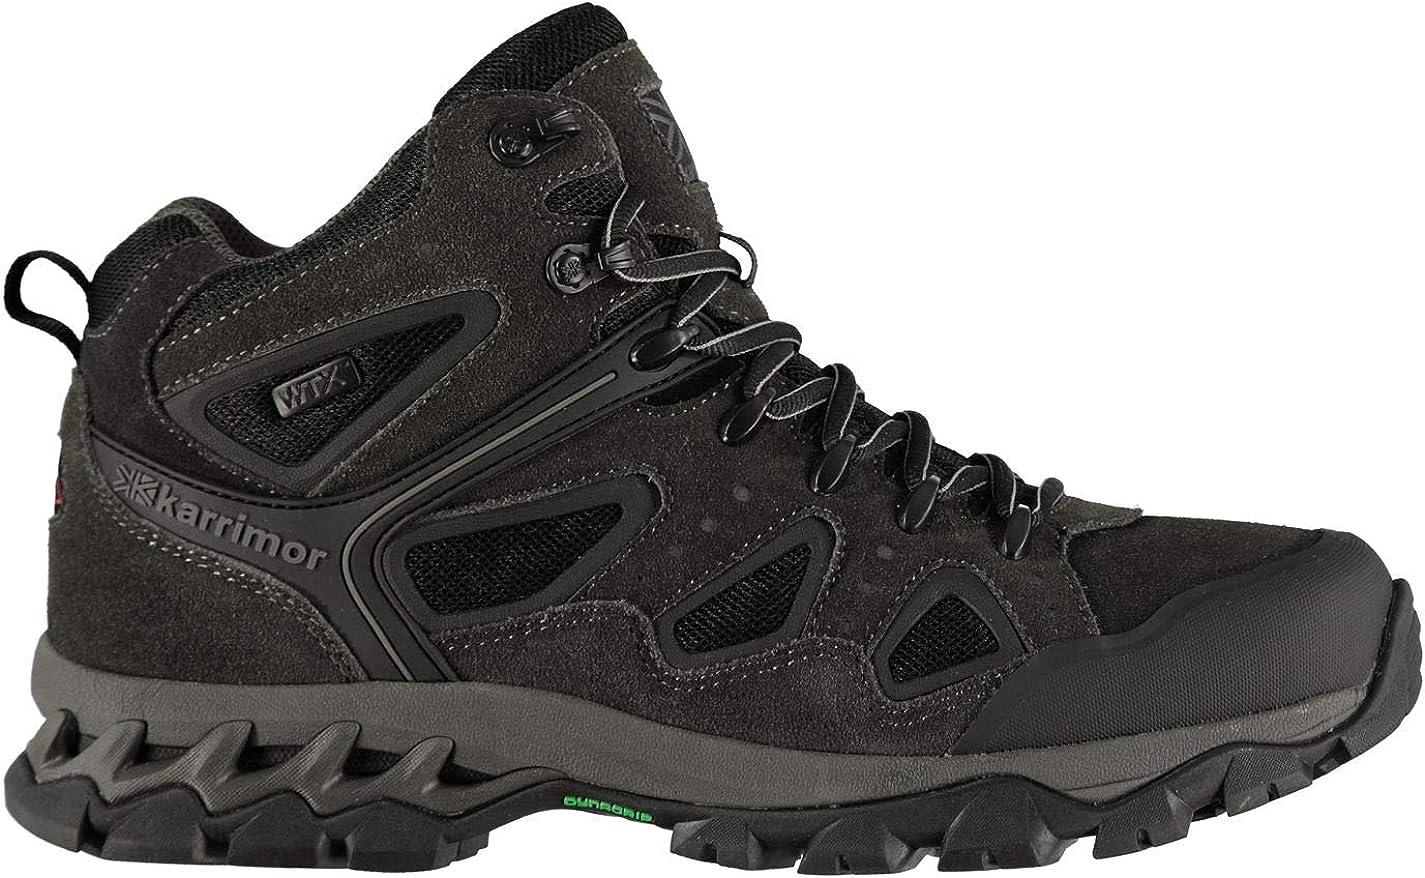 Karrimor Womens Ladies Ridge eVent Walking Shoes Hiking Outdoor Lace Up Footwear